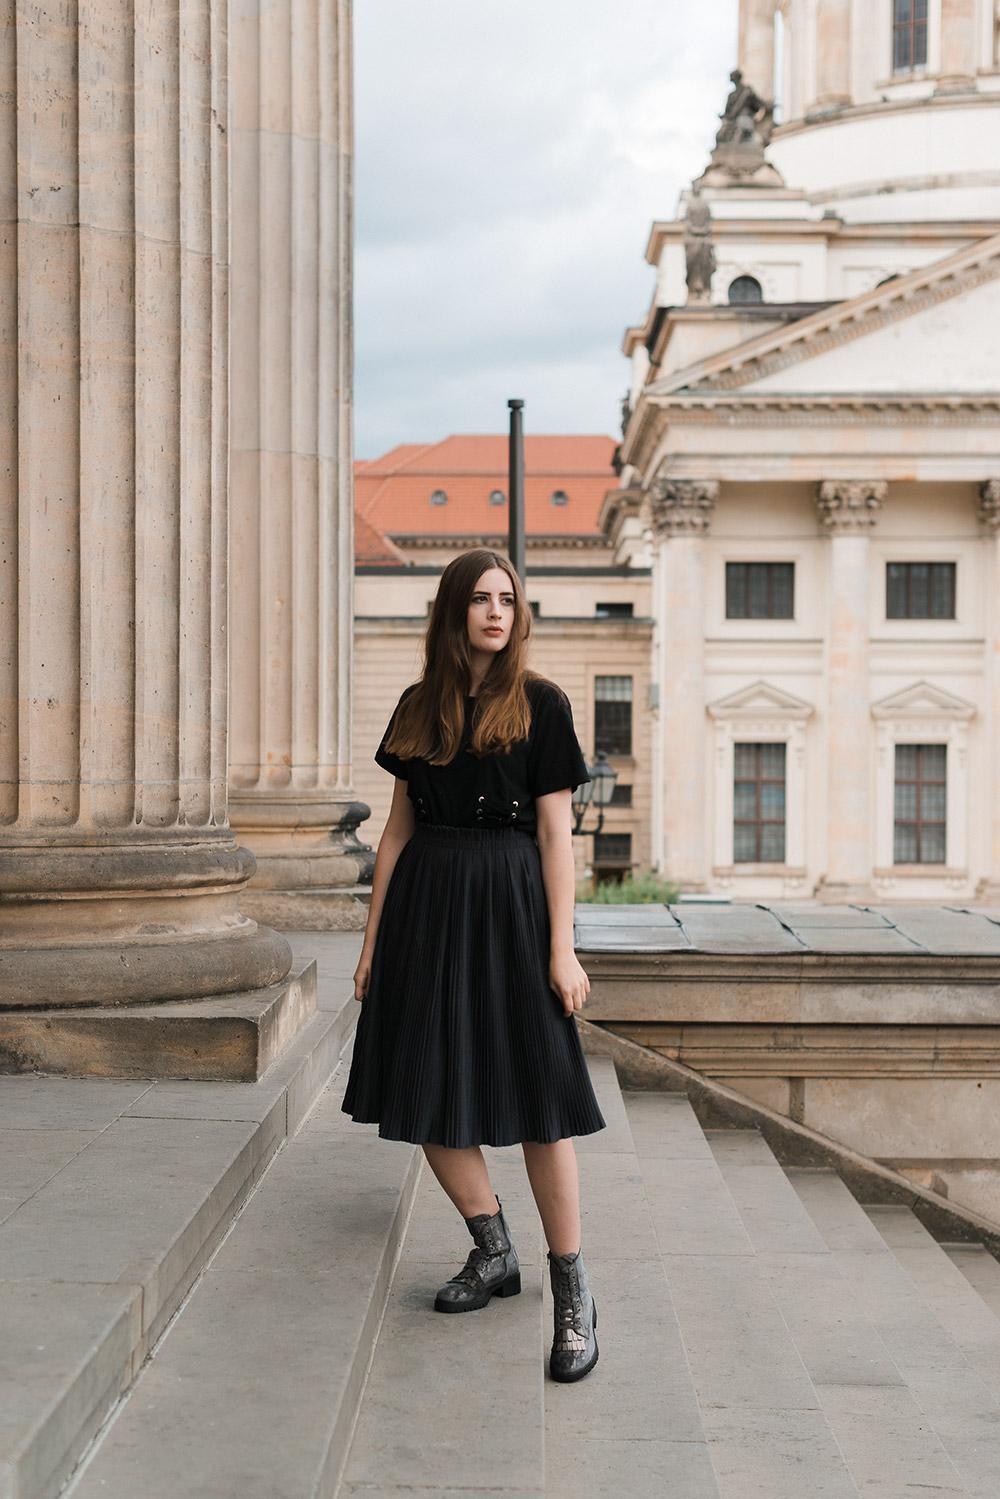 andysparkles-Modeblog Berlin-Graue Schnürboots-Plisseerock-Korsett T-Shirt